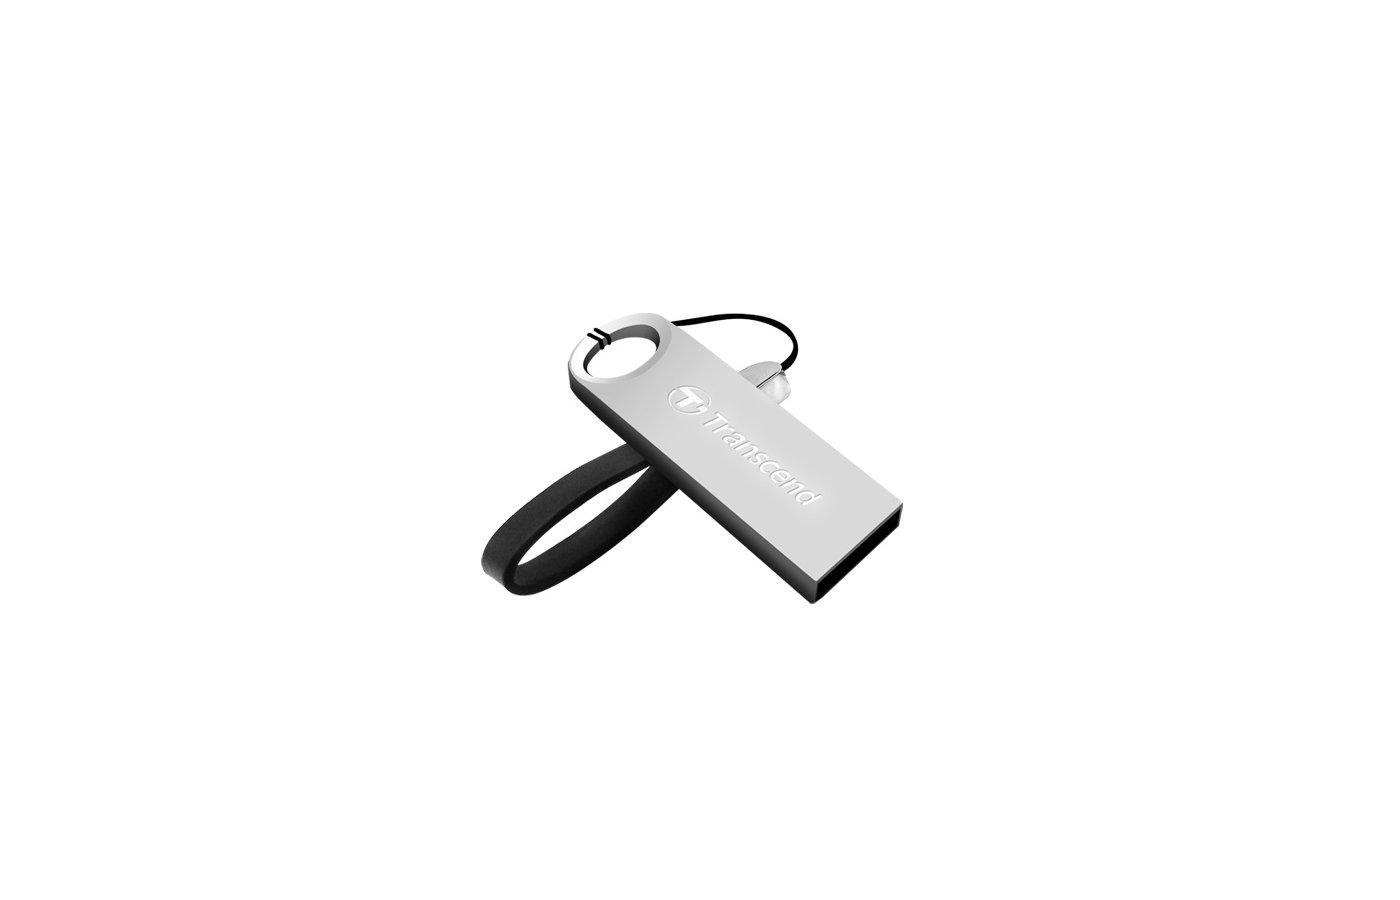 Флеш-диск USB 2.0 Transcend JetFlash 16GB 520 (TS16GJF520G)